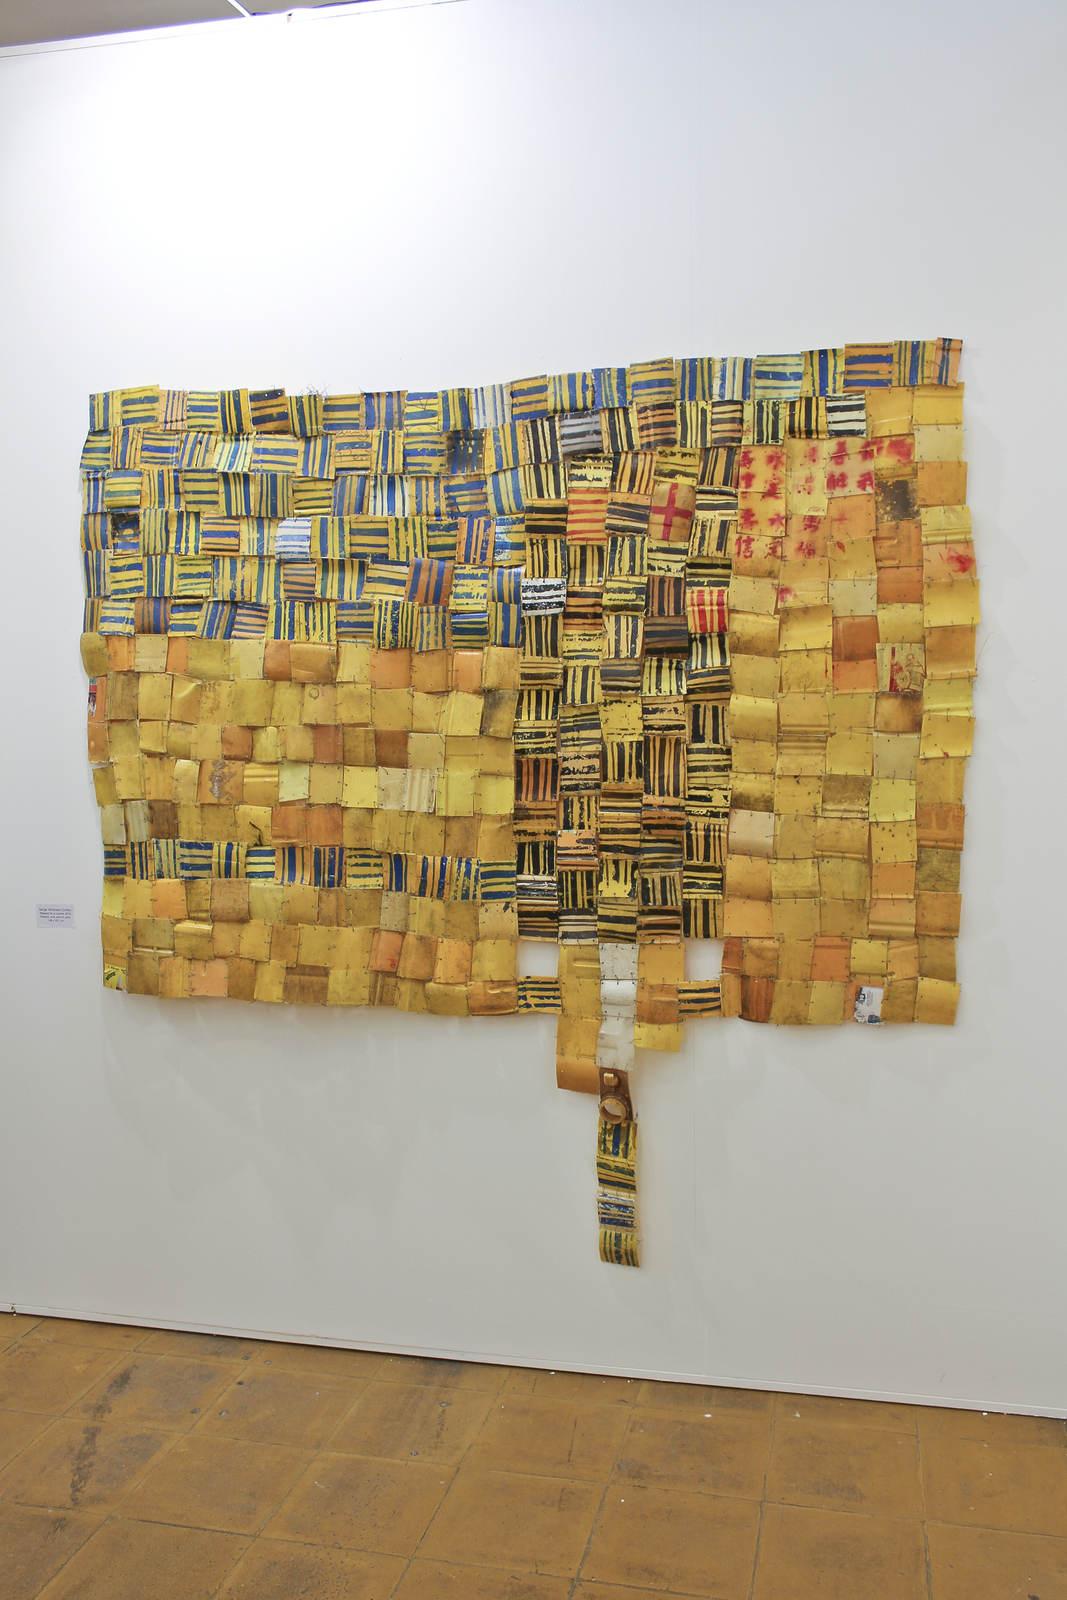 Serge Attukwei Clottery at GNYP Gallery, Berlin 02